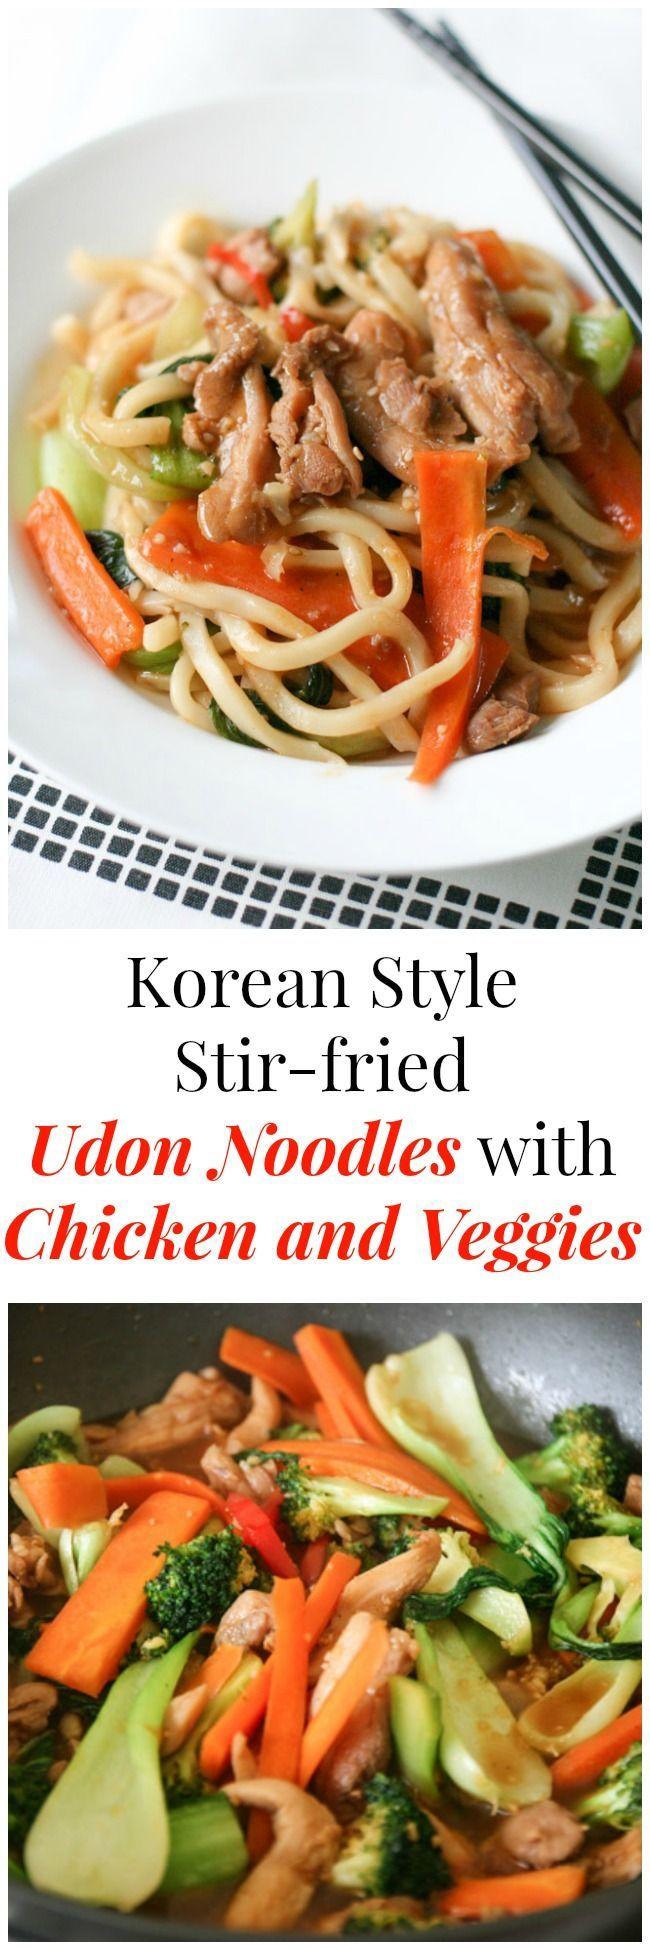 Korean Style Stir-fried Udon Noodles with Chicken and Veggies | MyKoreanKitchen.com